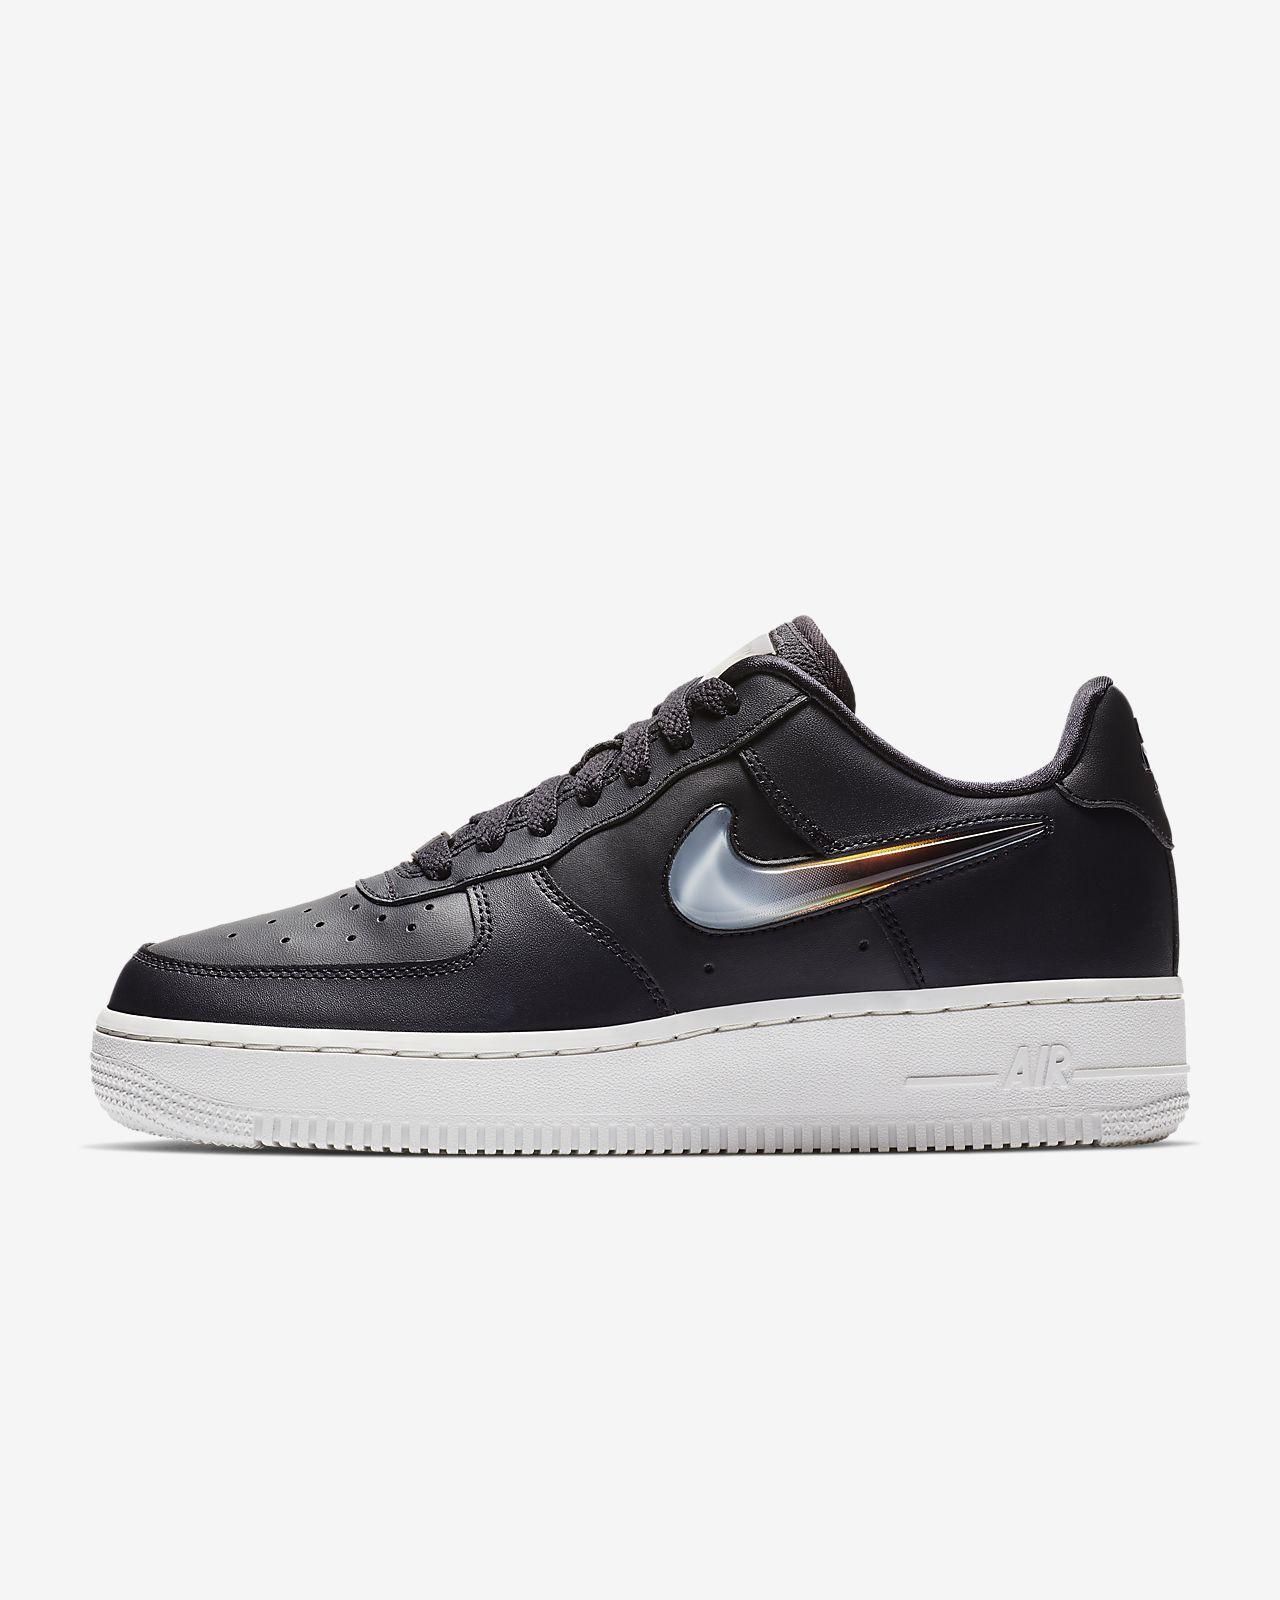 half off 45291 c77bf Chaussure Nike Air Force 1 \u002707 SE Premium pour Femme ...